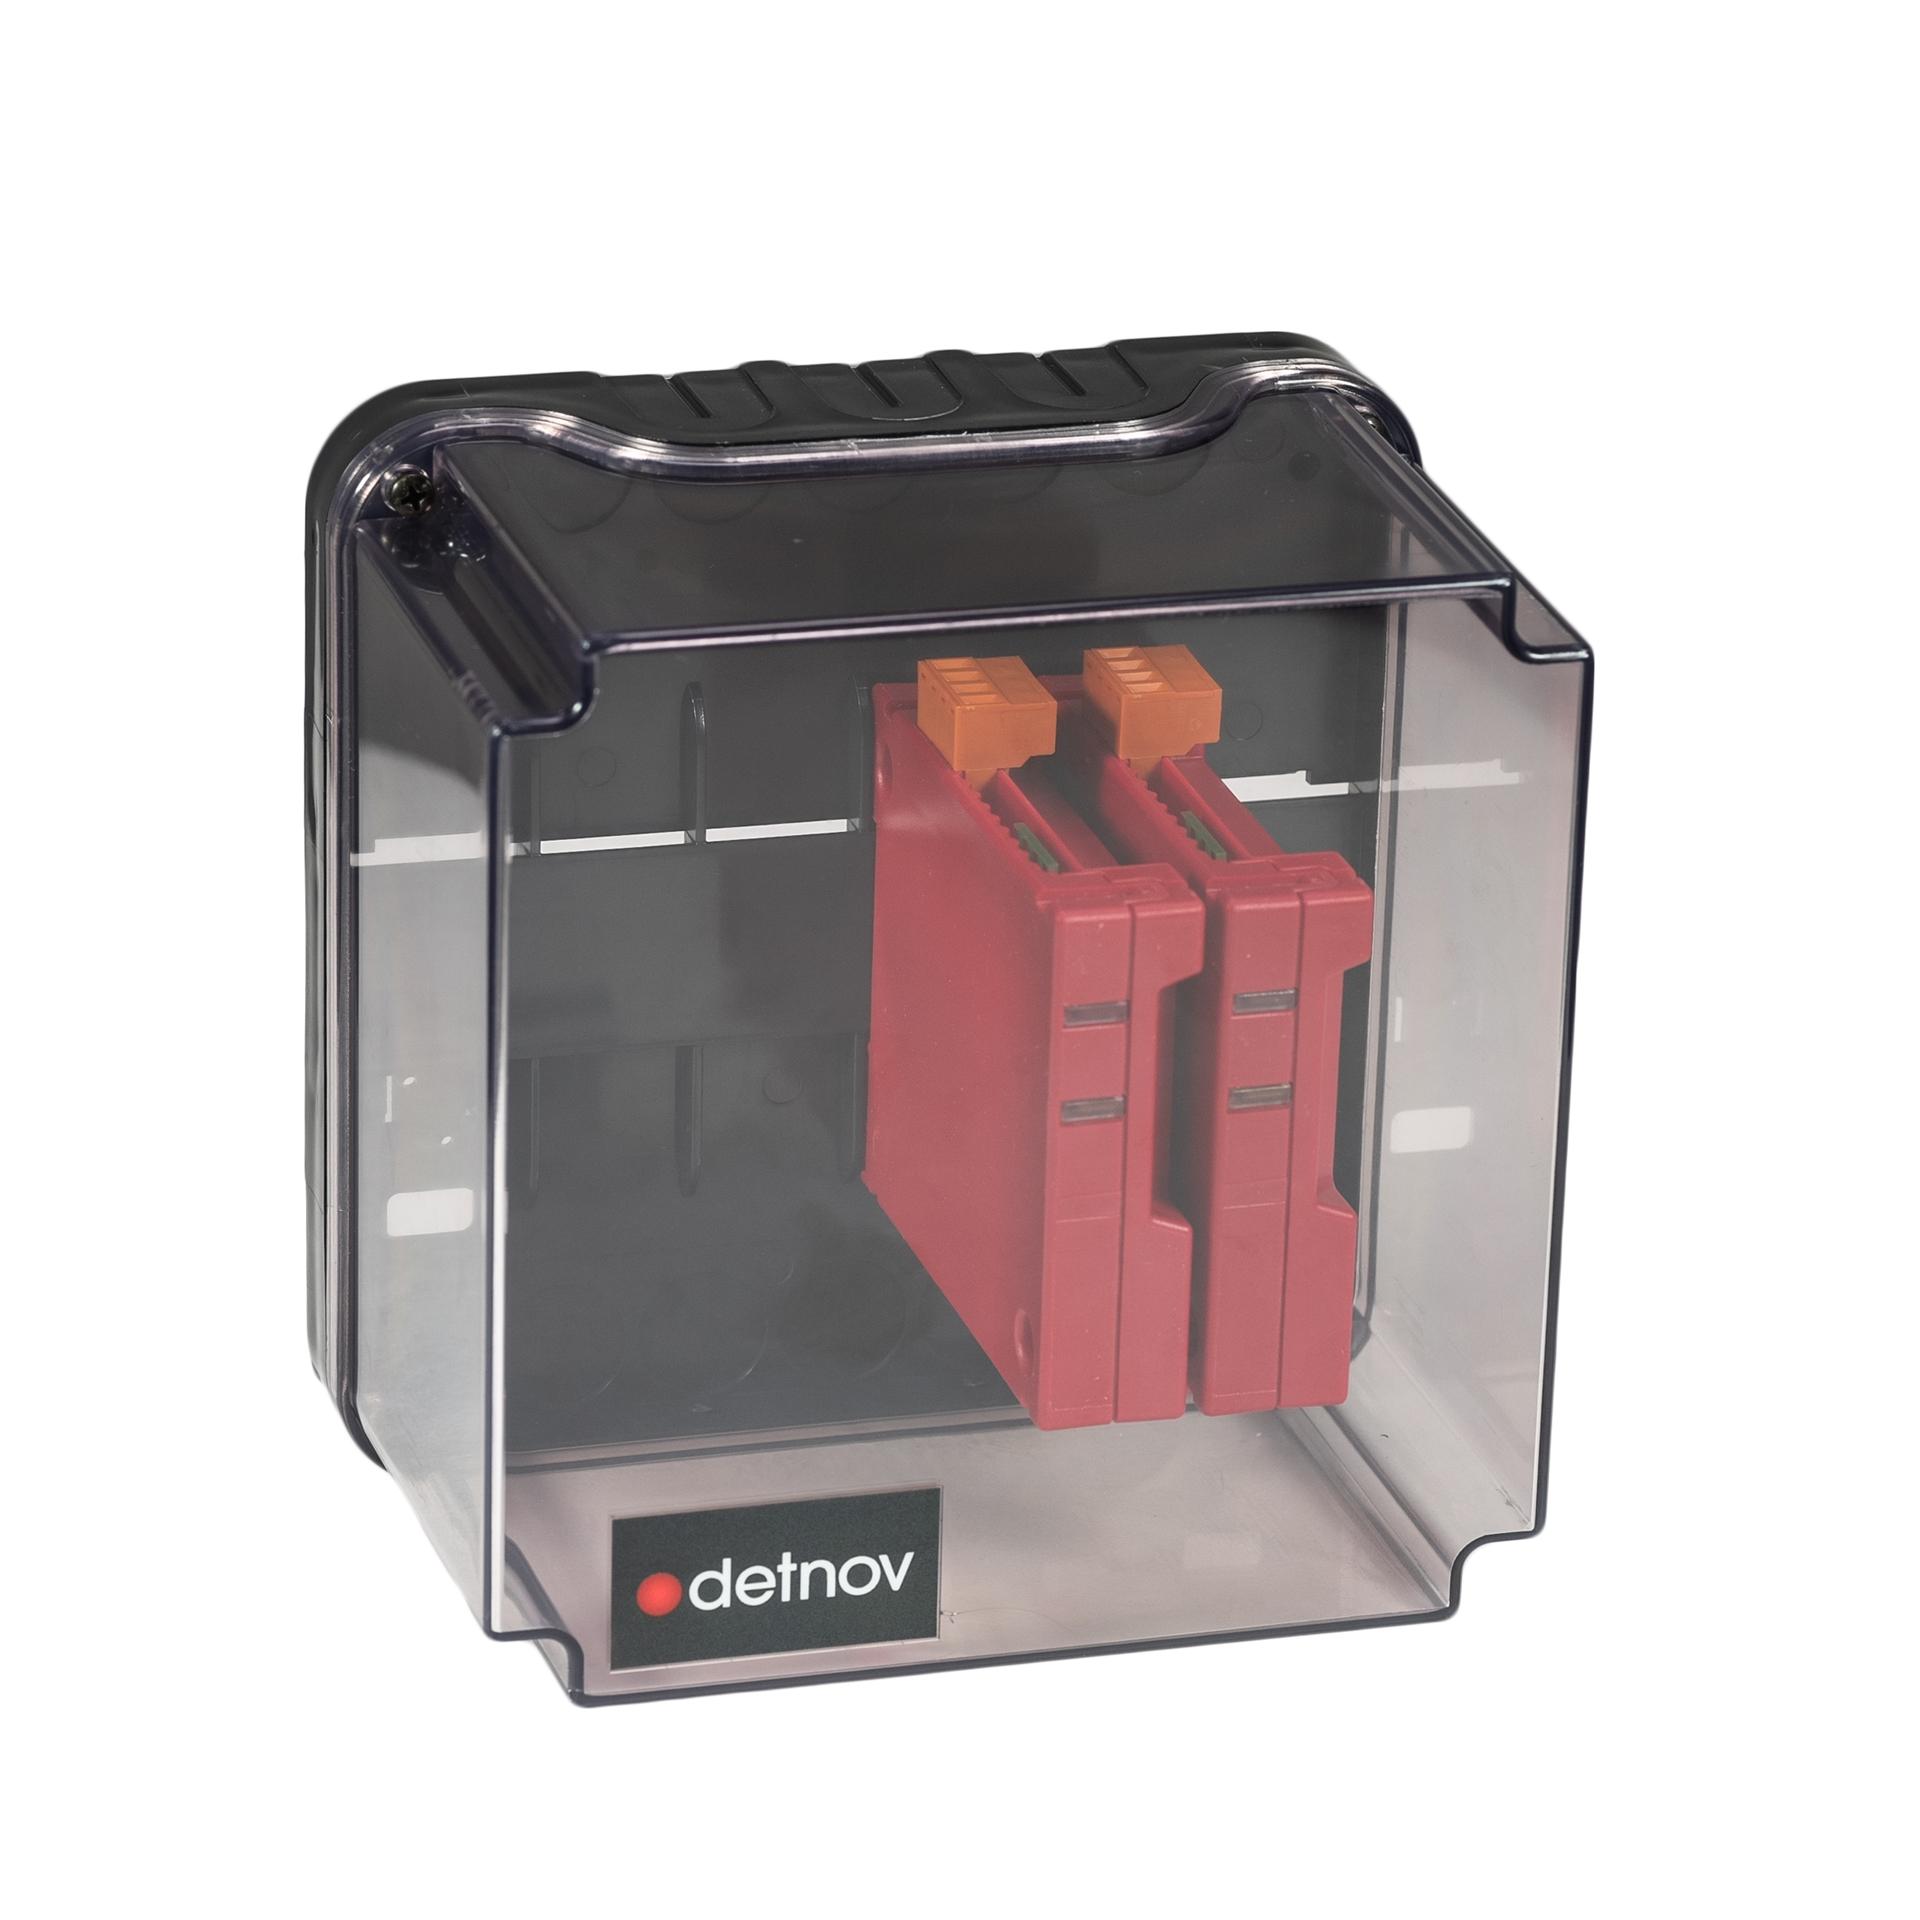 Picture of BOX-SIX  Διάφανο Κουτί Για Εγκατάσταση Modules Σειράς Mad-400 Detnov